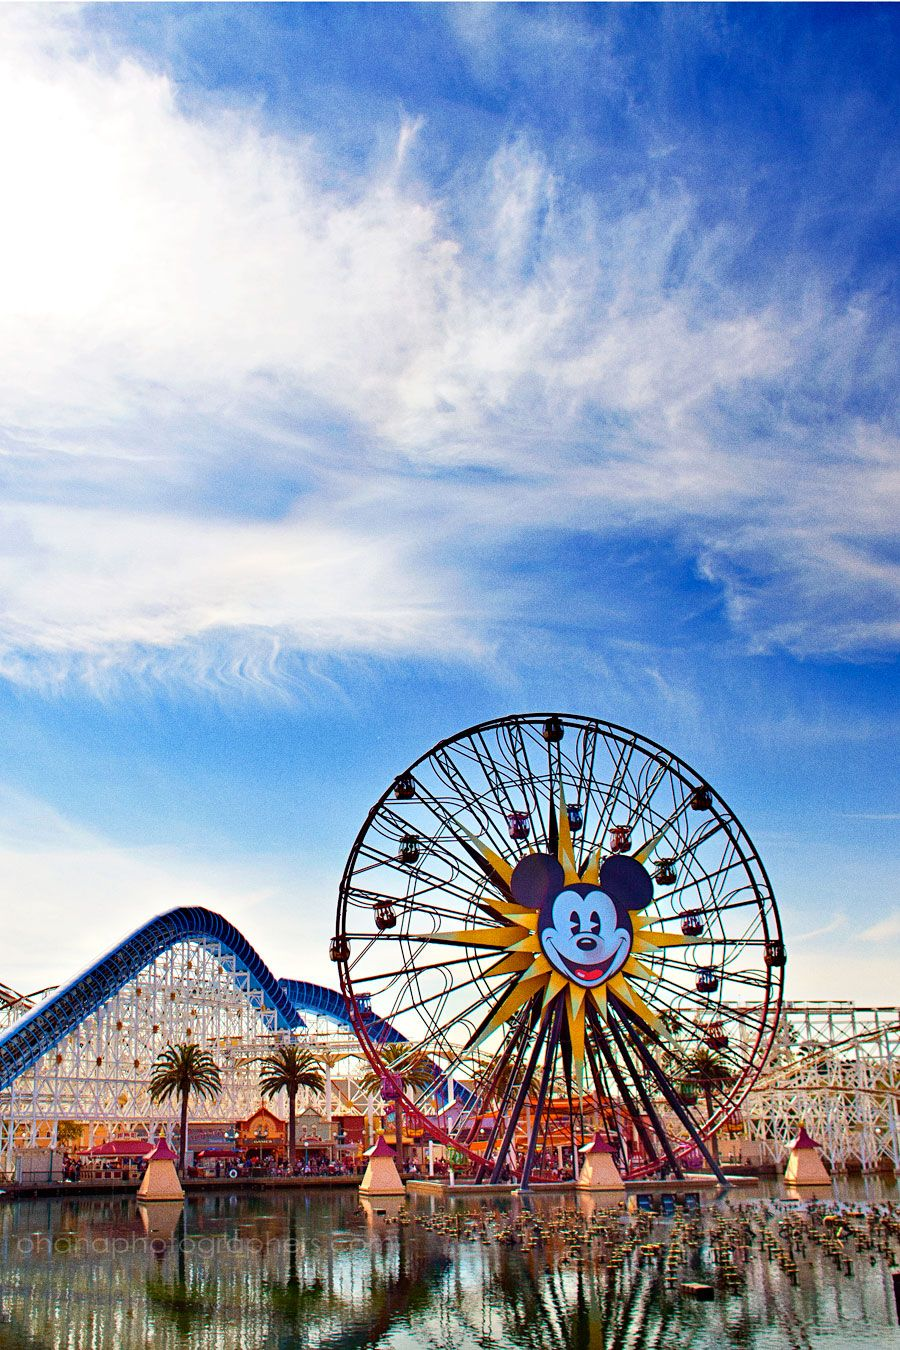 Disneyland California Adventure Disneyland California Adventure Disneyland Anaheim Disneyland Photography